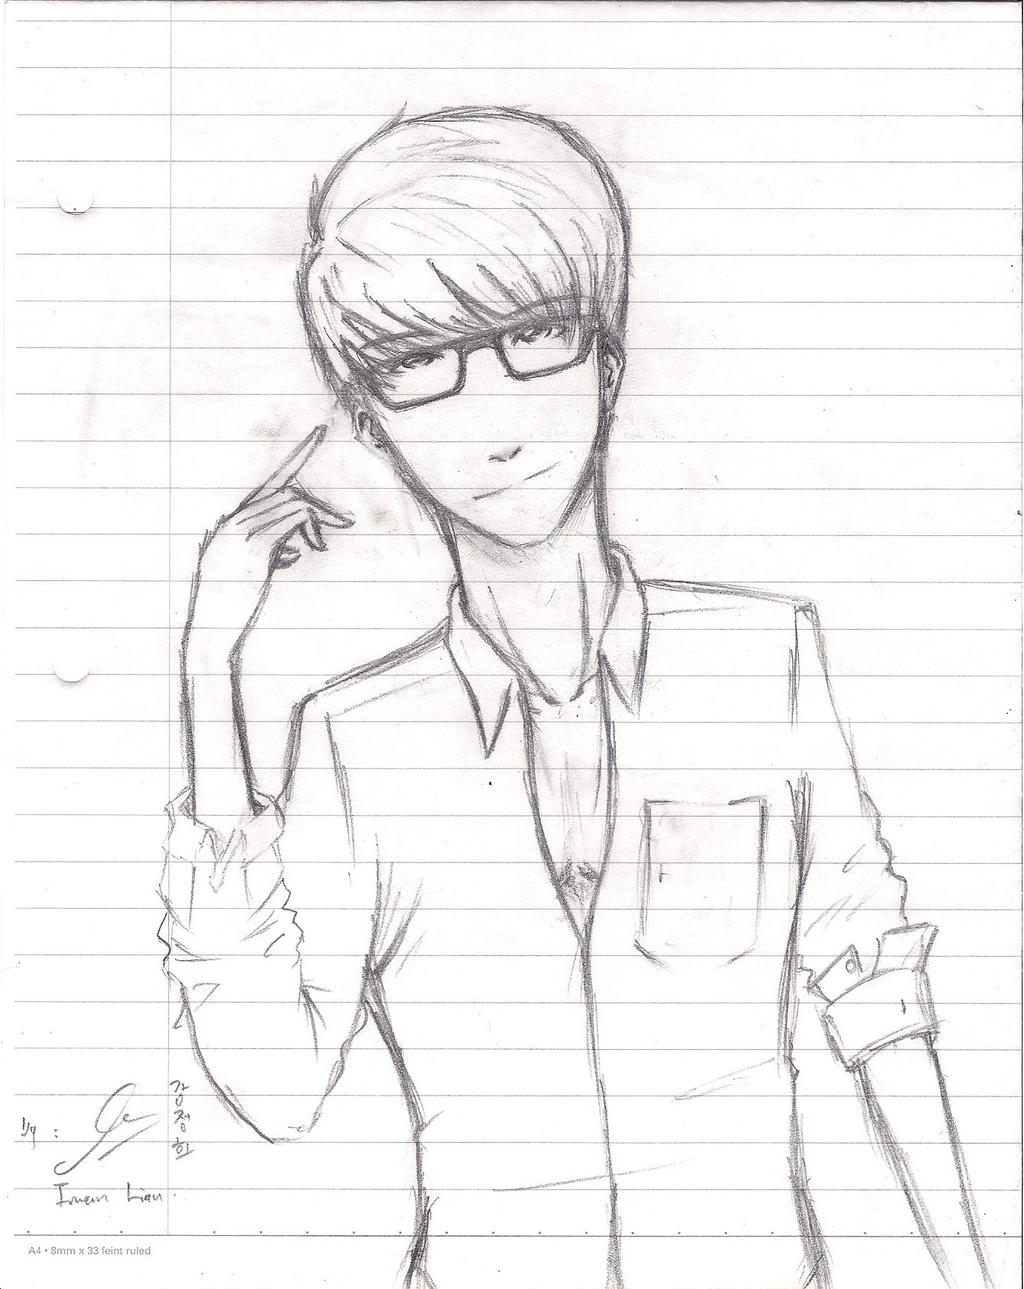 How to draw anime glasses cinemas 93